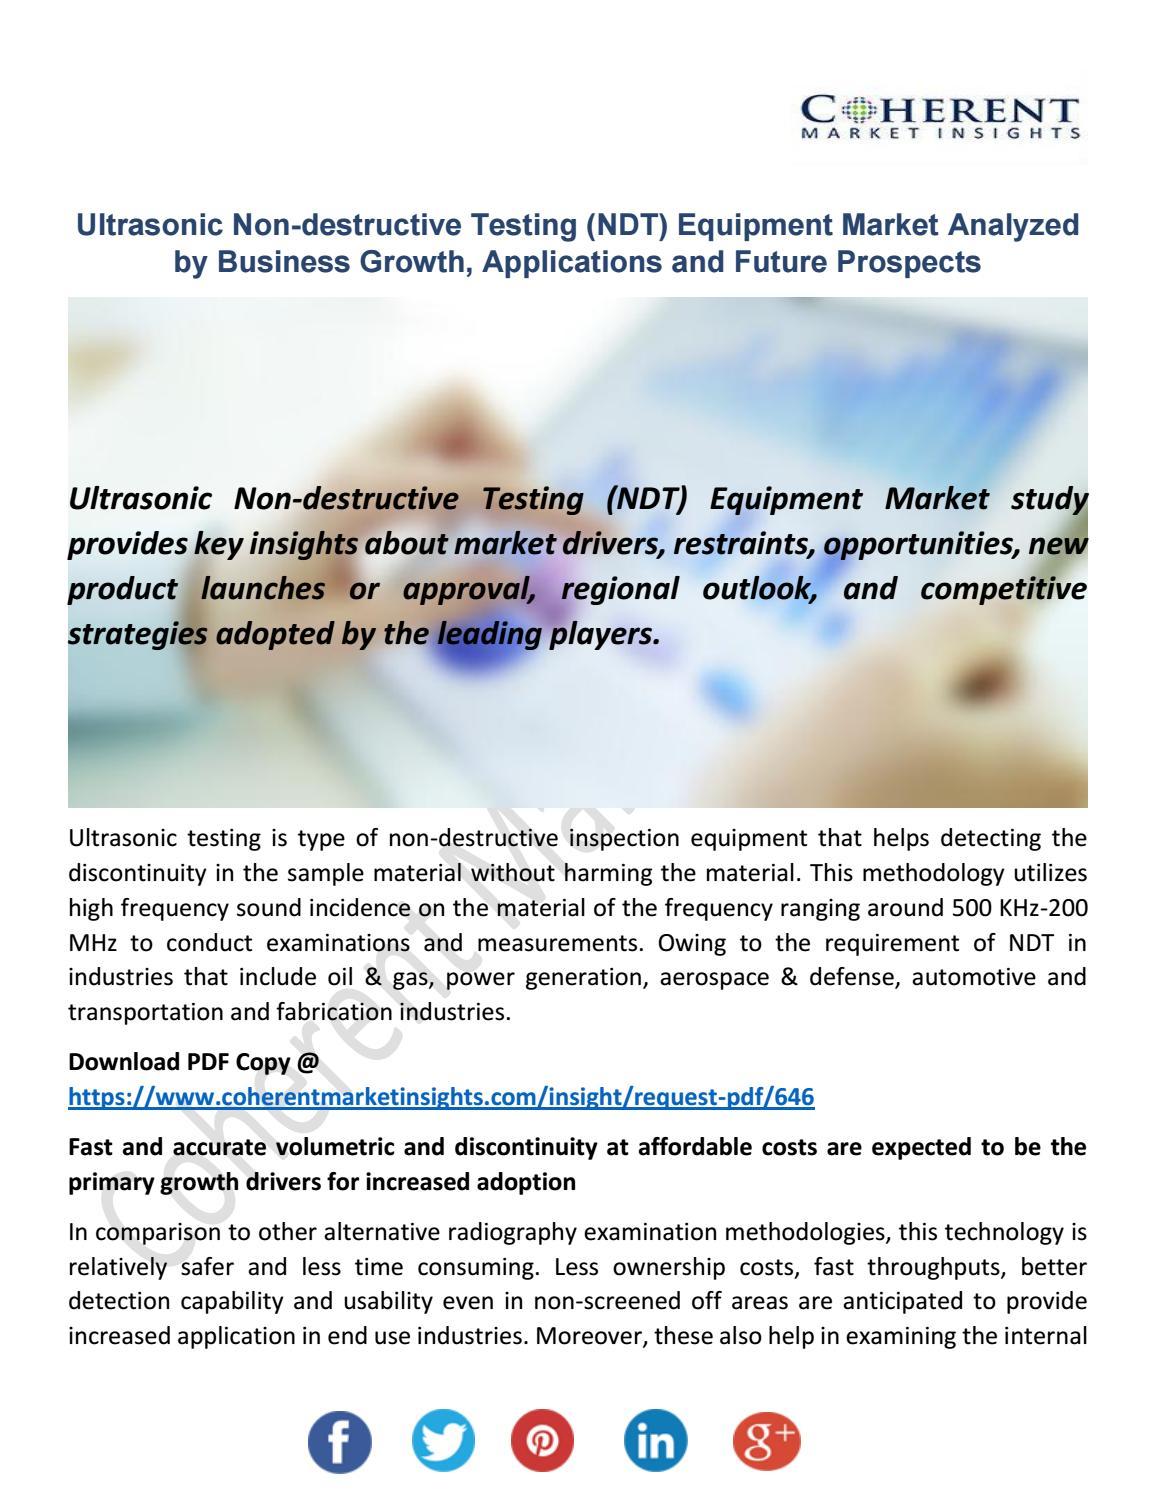 Ultrasonic Non-destructive Testing (NDT) Equipment Market by